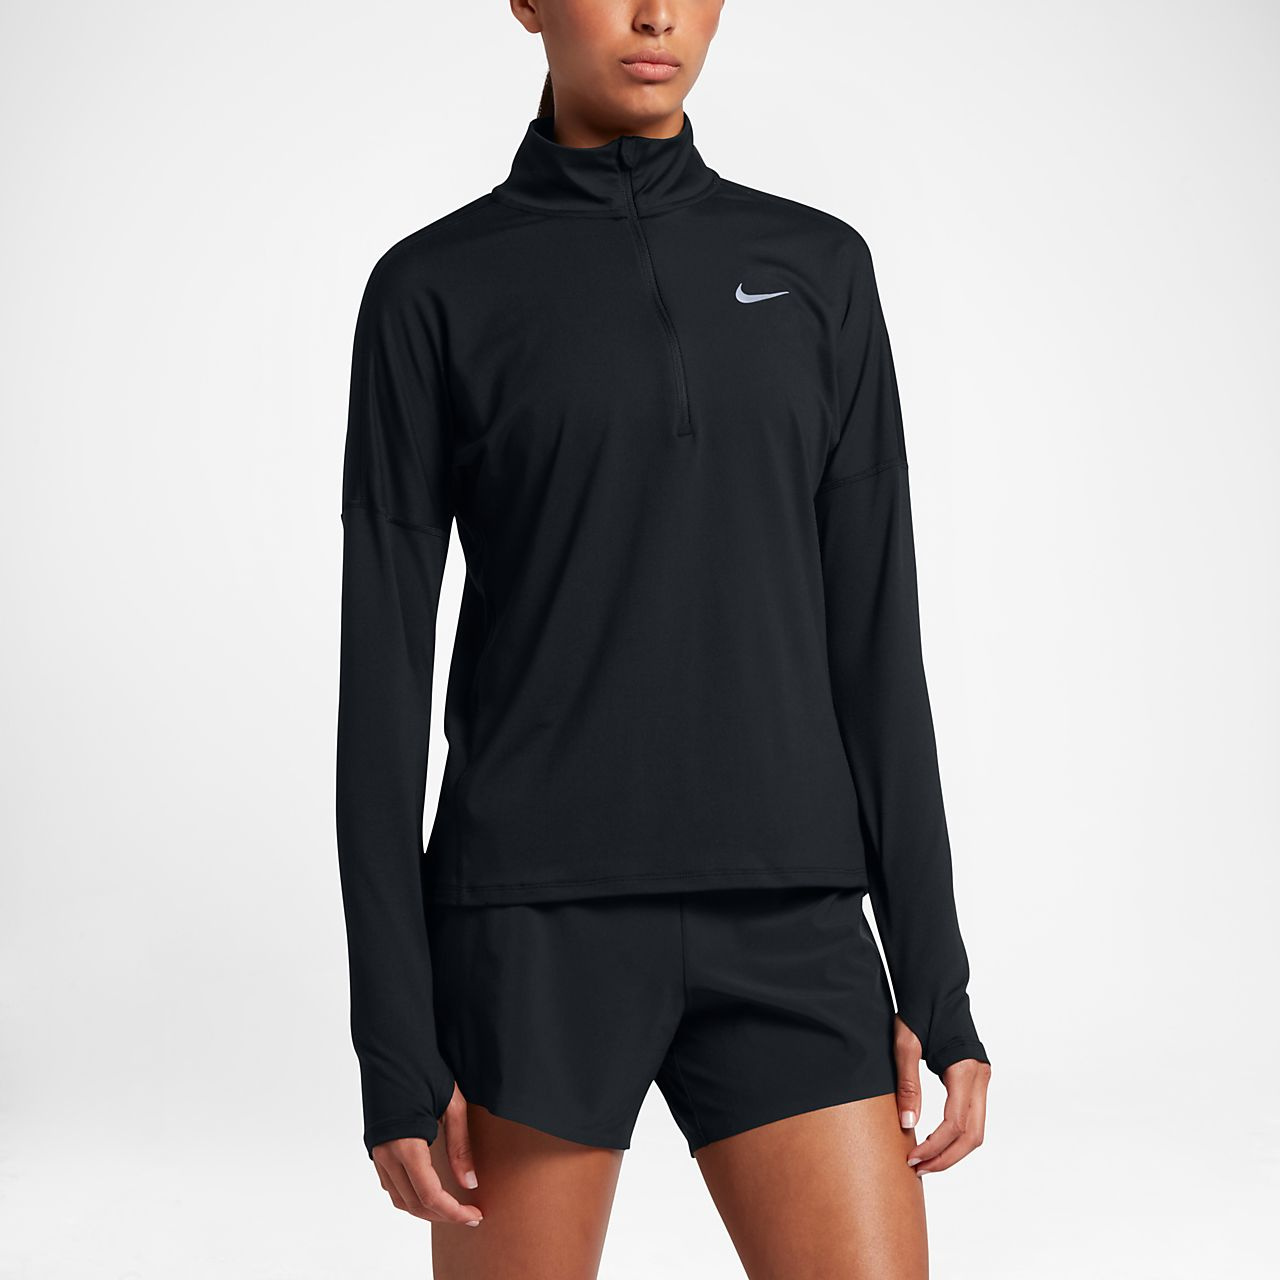 9665665b289 Nike Dri-FIT Element Women s Long-Sleeve Running Half-Zip Top. Nike ...